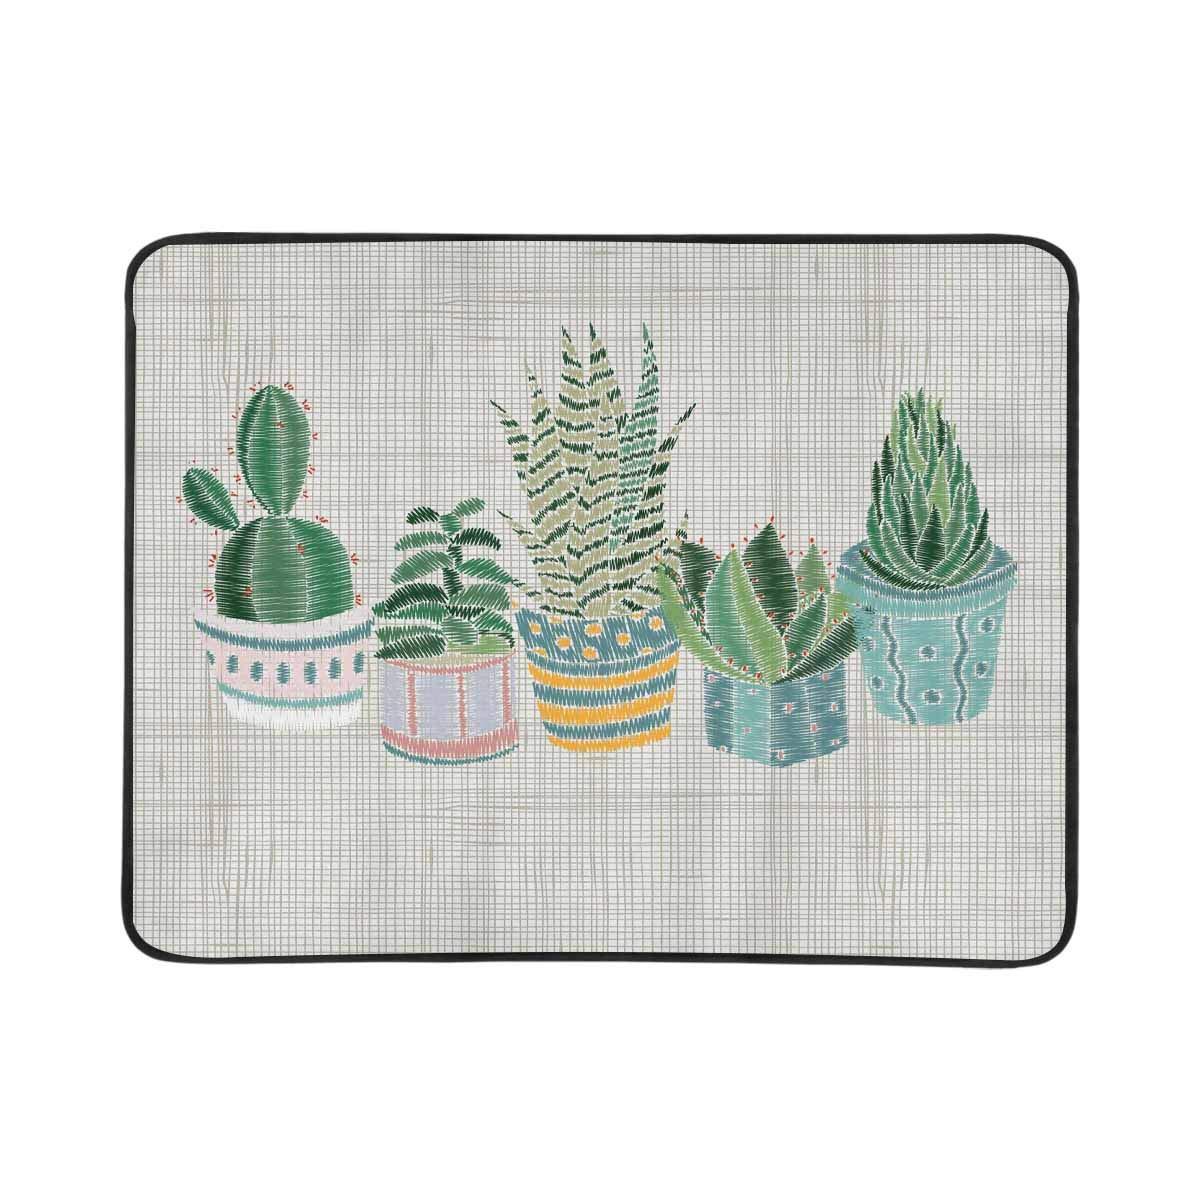 InterestPrint Sand Free Beach Mat 78'' x 60'' Printed Cactus Pots Waterproof Outdoor Beach Blanket